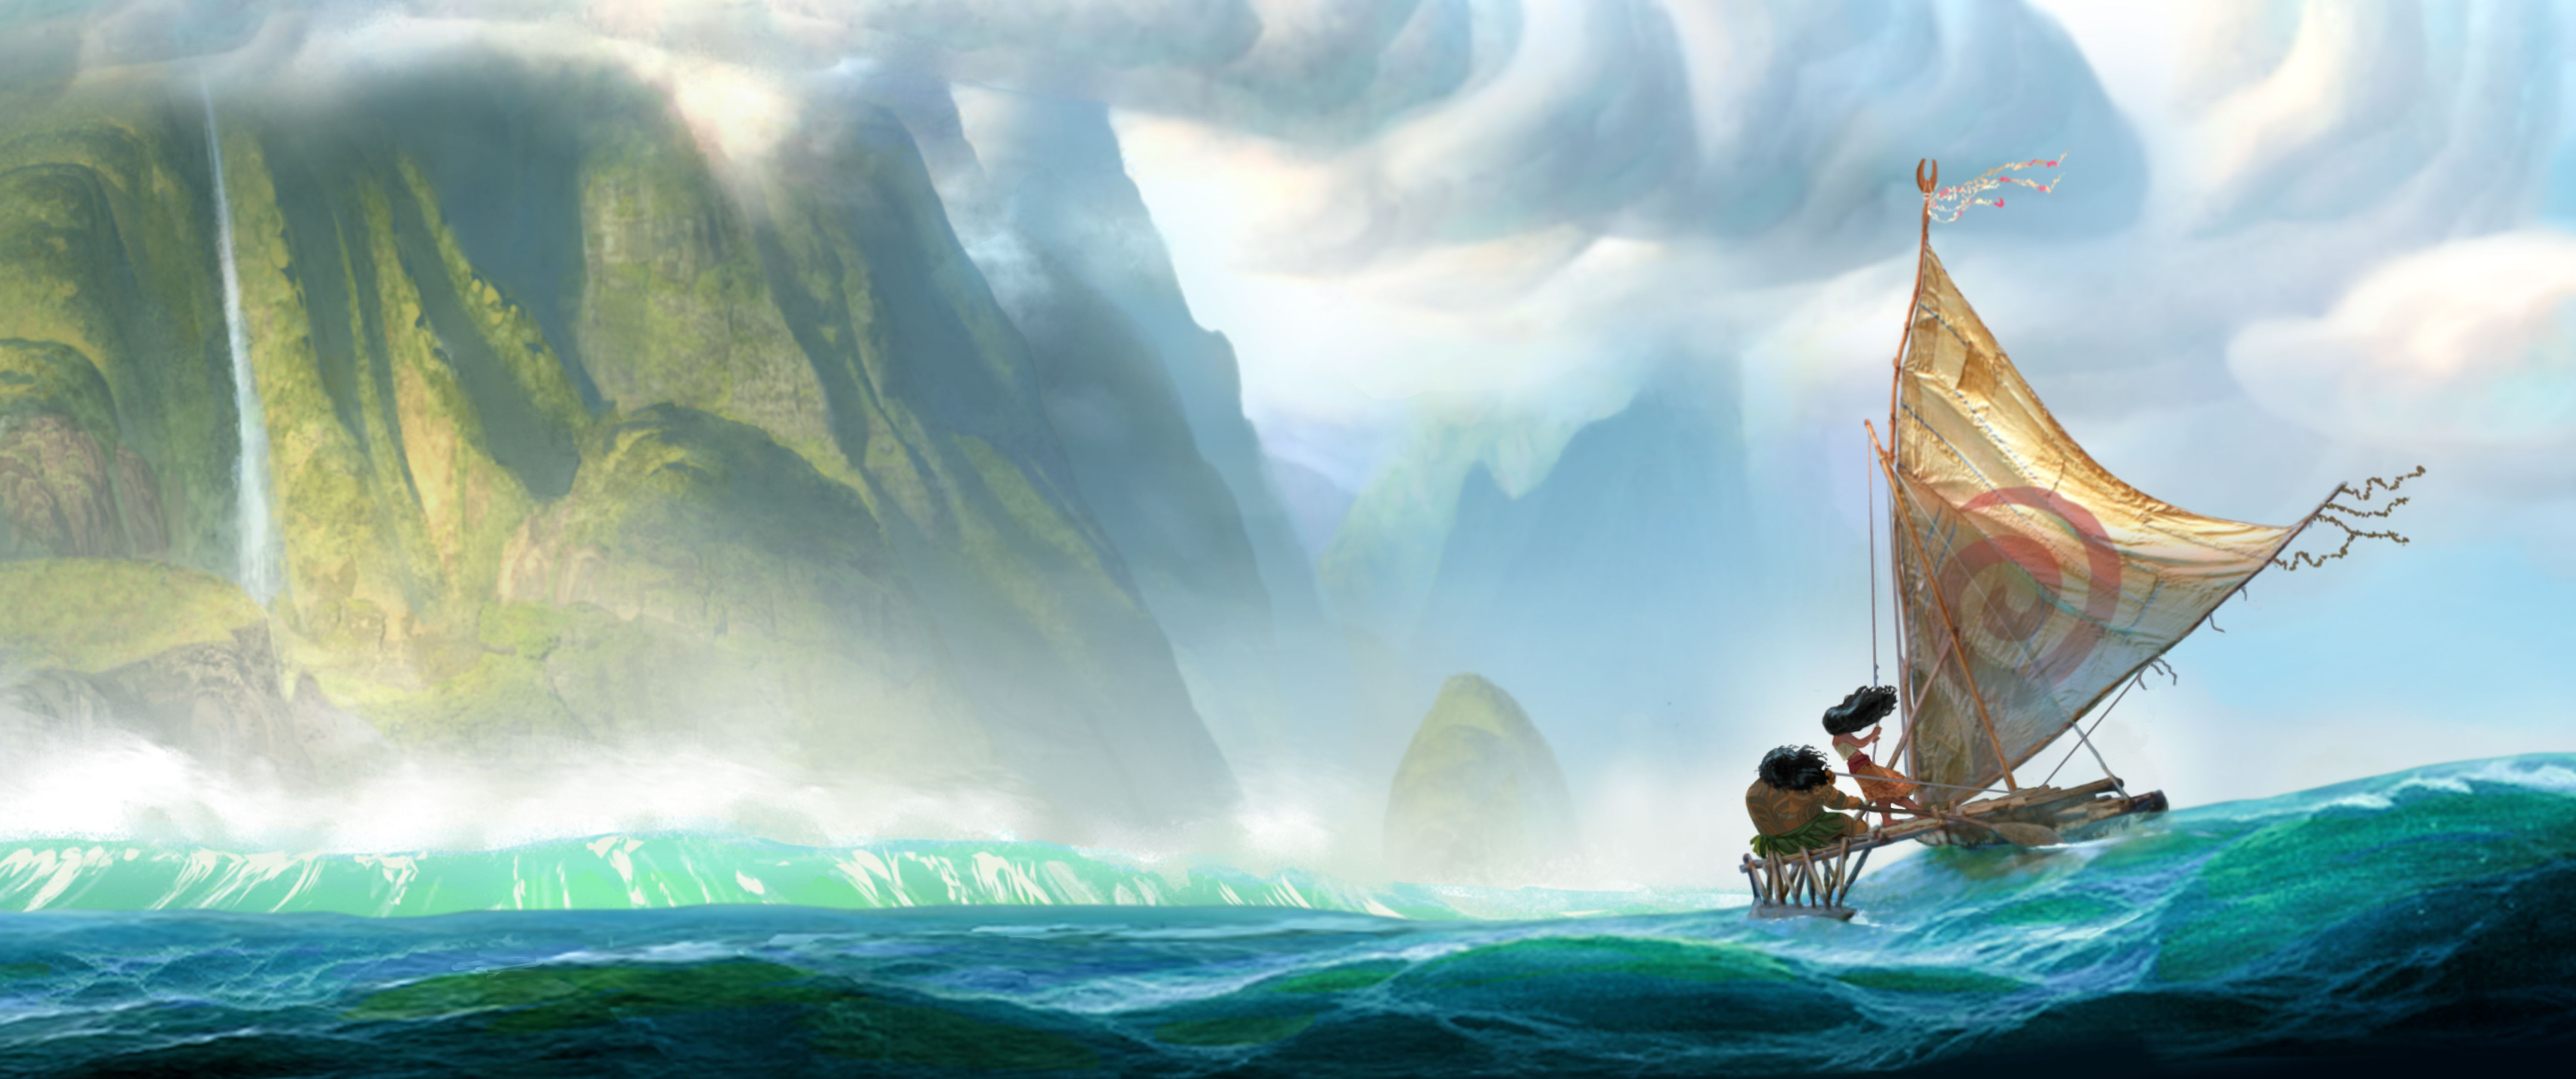 Disney Up Concept Art